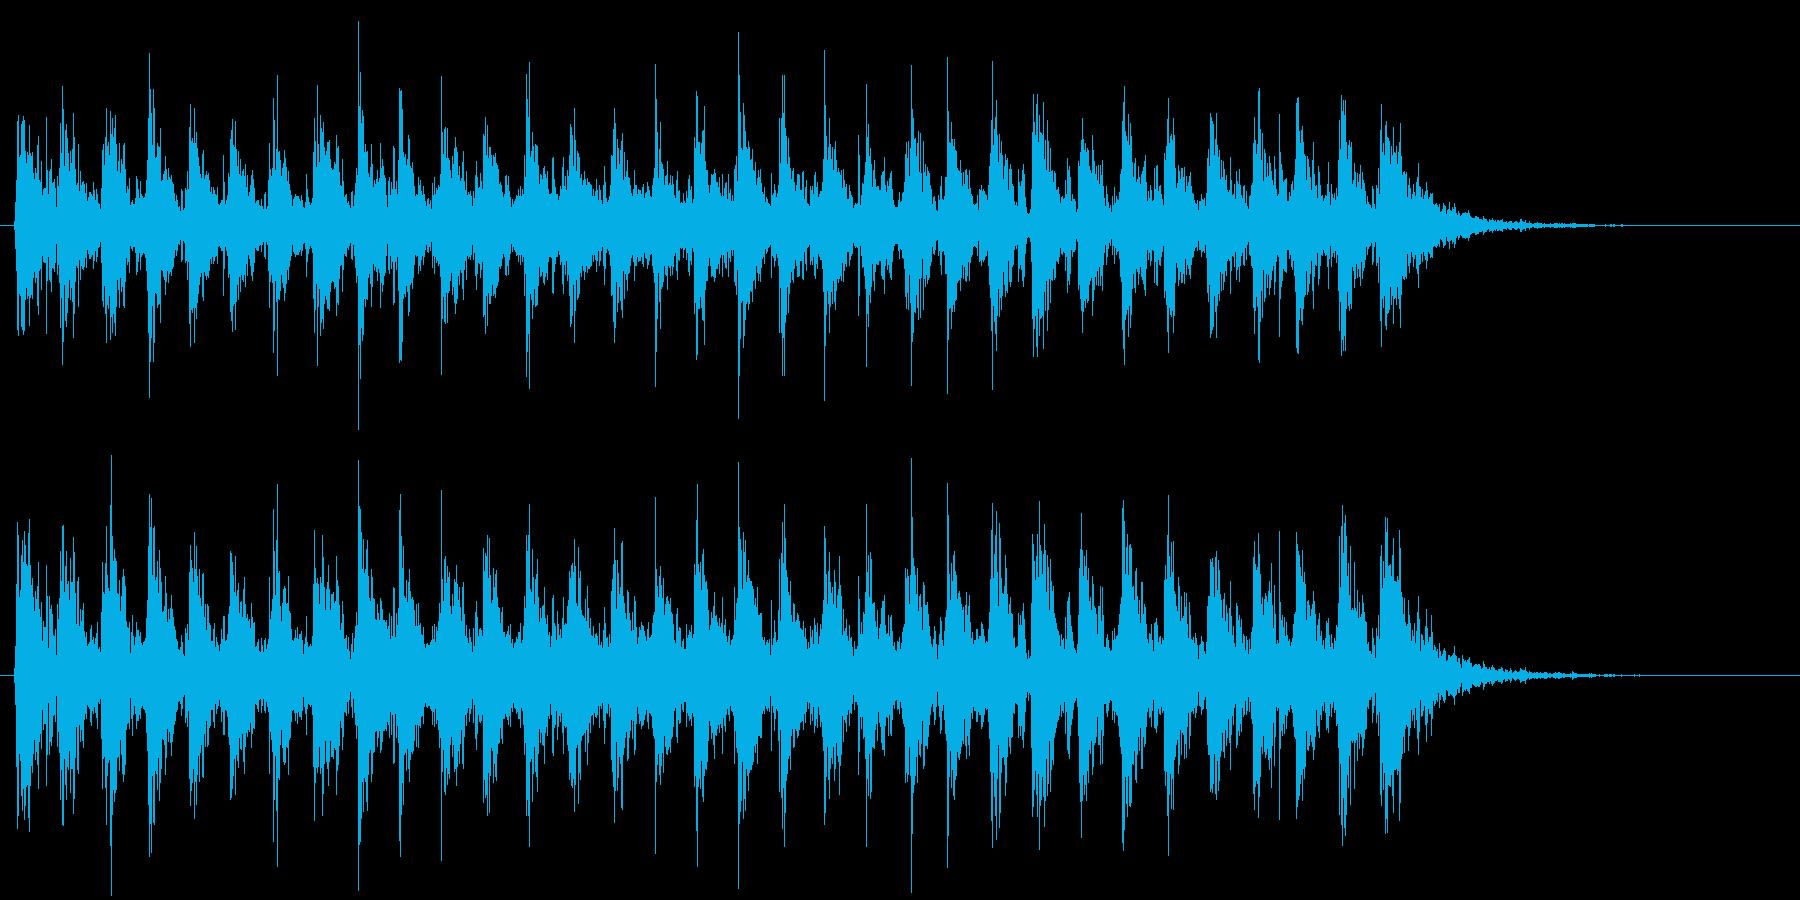 Xmasに最適トナカイベルのループ音09の再生済みの波形